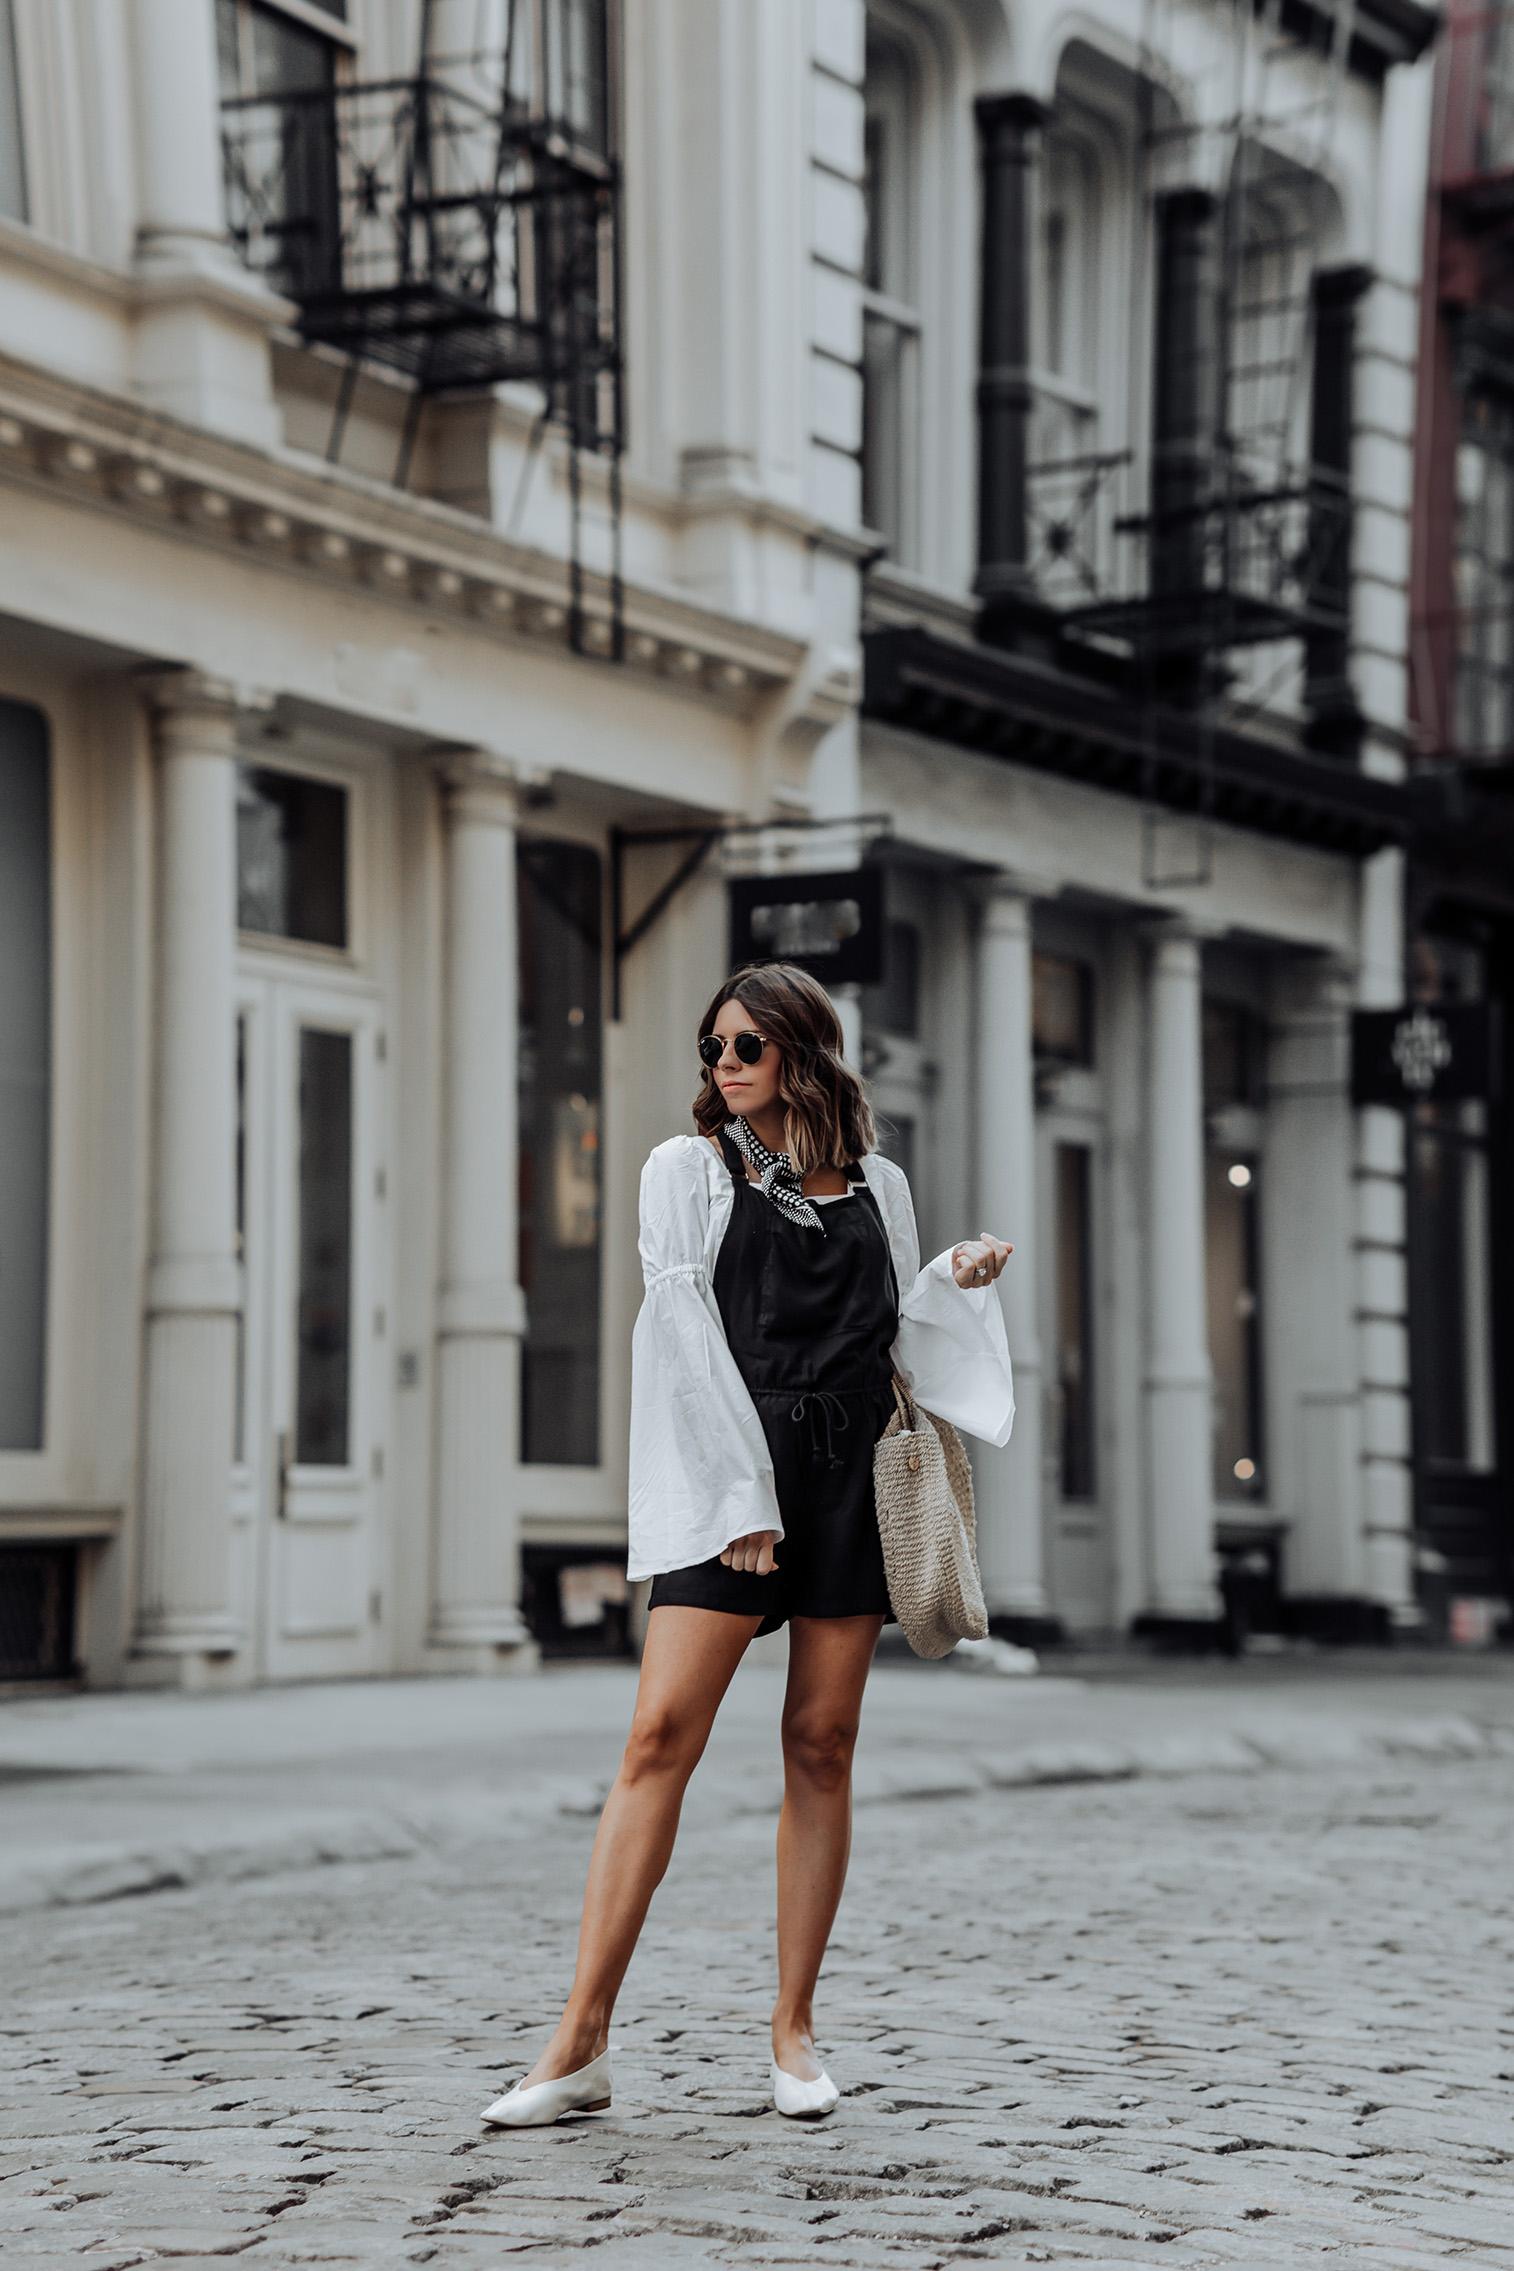 Tiffany Jais fashion and lifestyle blogger of Flaunt and Center   NYC fashion blogger   Kohl's outfit style   Streetstyle blog #liketkit #ootd #kohls #streetstyle